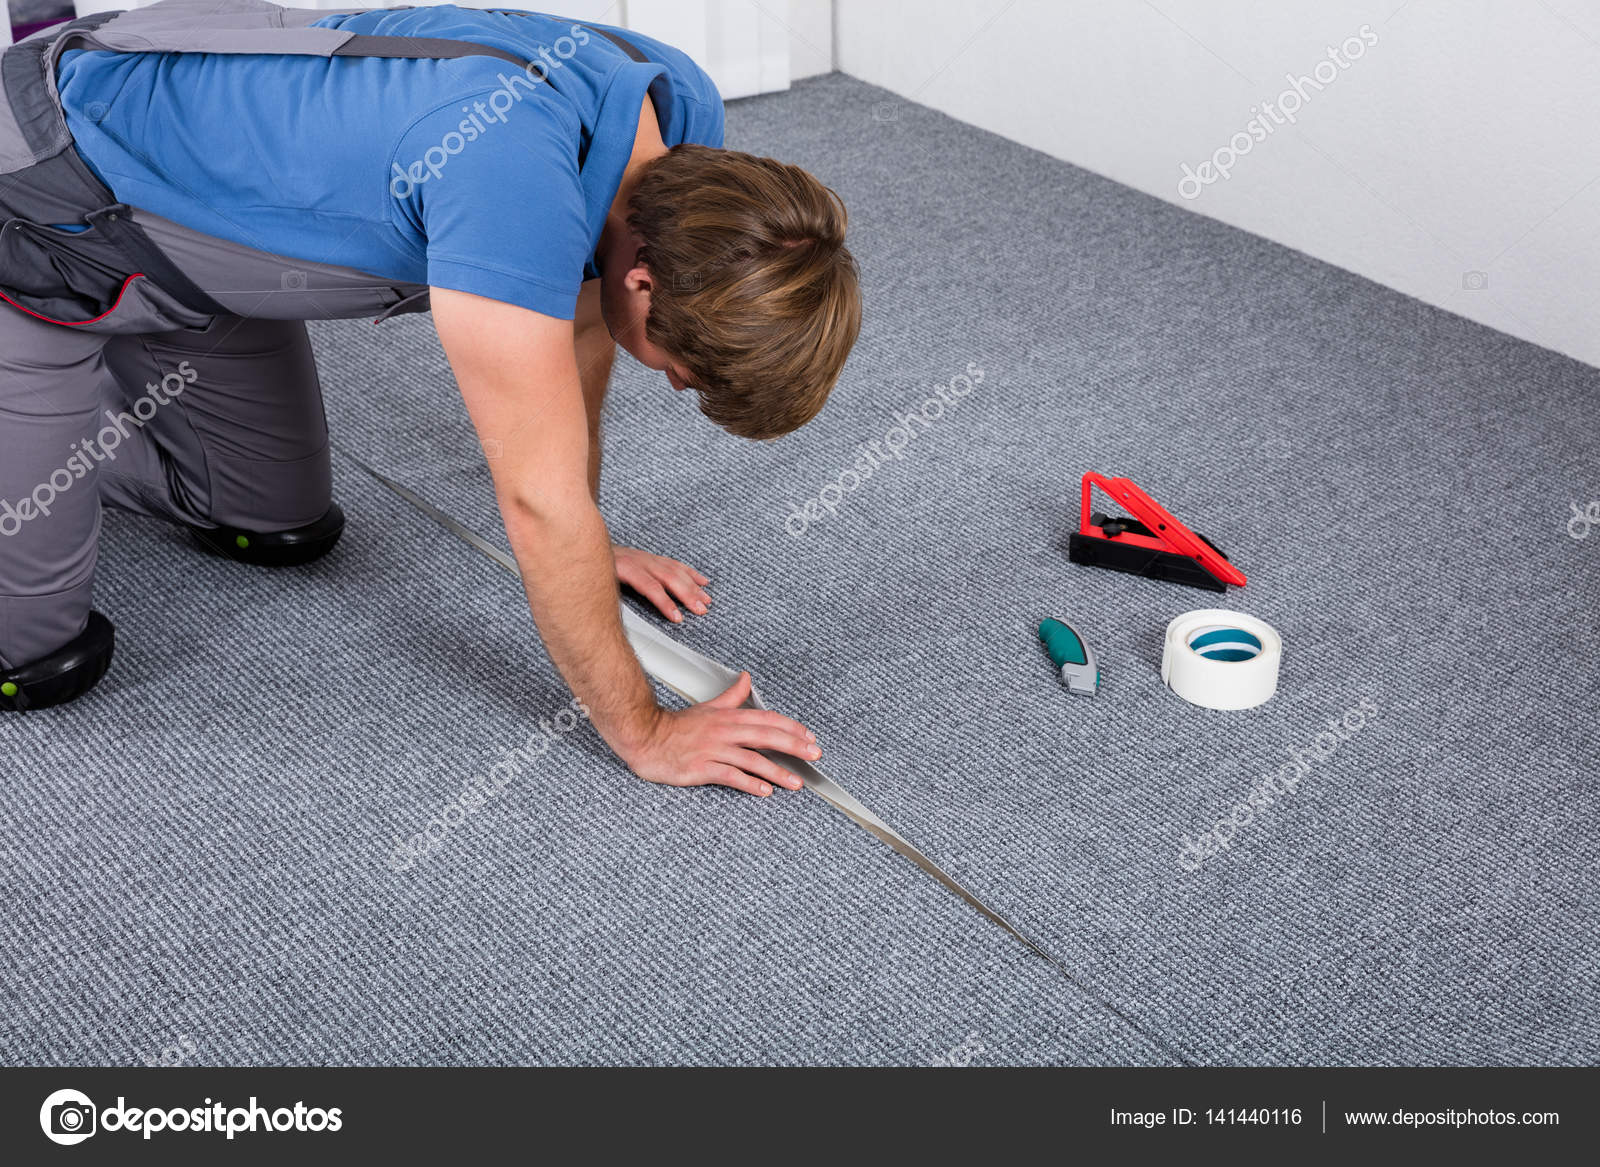 Timmerman tapijt leggen u stockfoto andreypopov